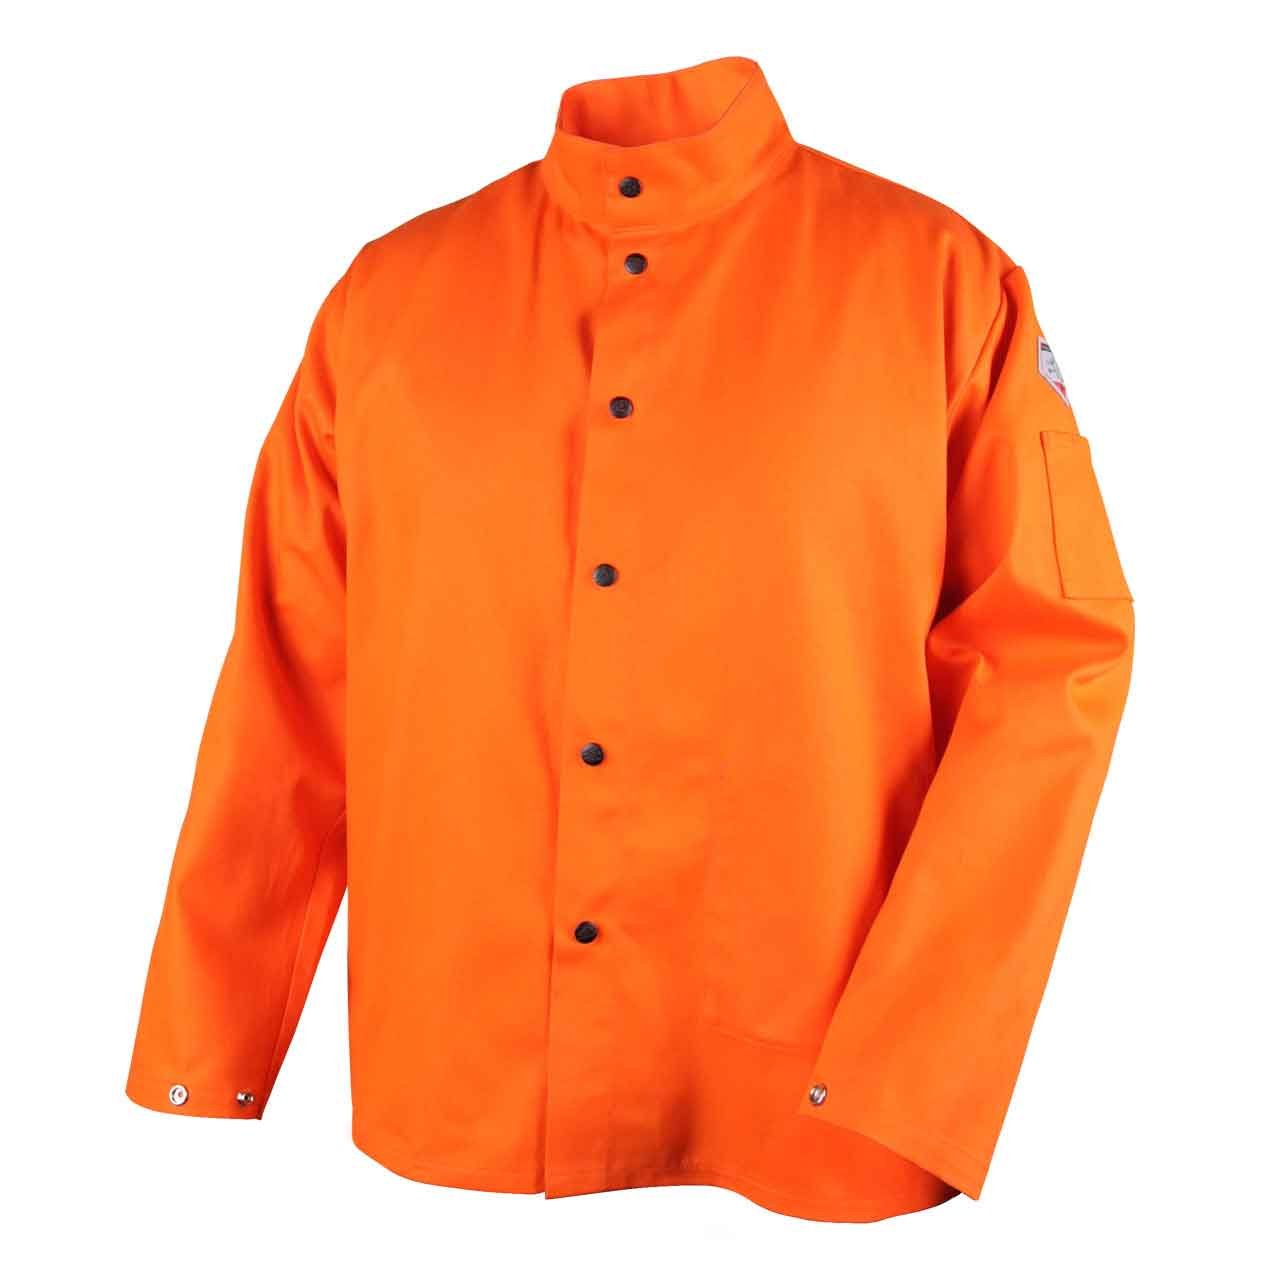 Revco FO9-30C-XL Flame Resistant Cotton Welding Jacket, X-Large